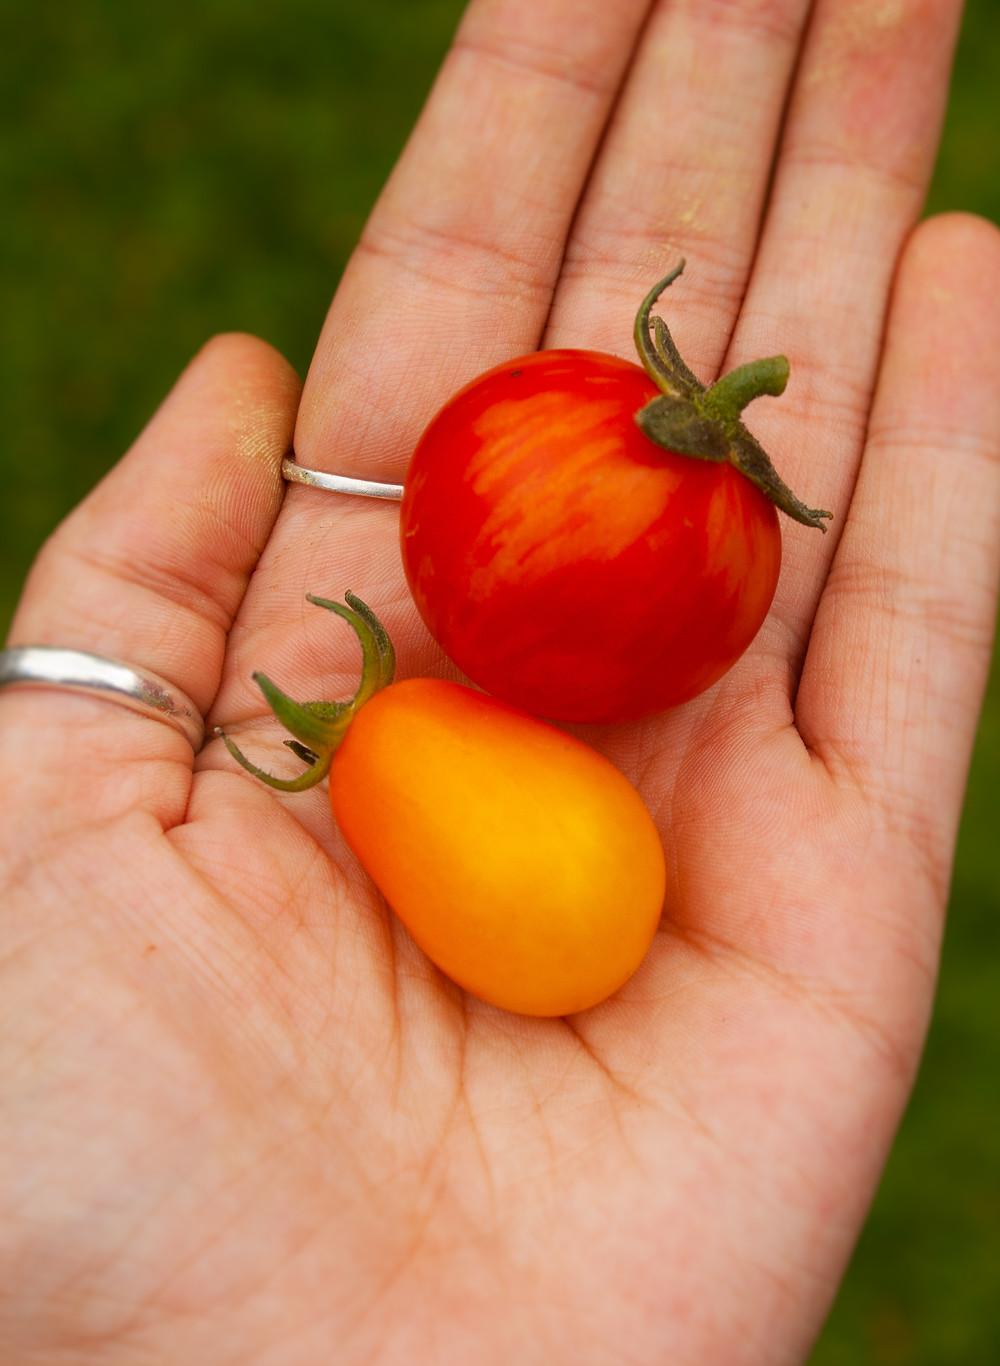 Homegrown tomatoes | Tomato Chutney | Vegan and gluten free recipe | Grow your own | The Dopey Vegan